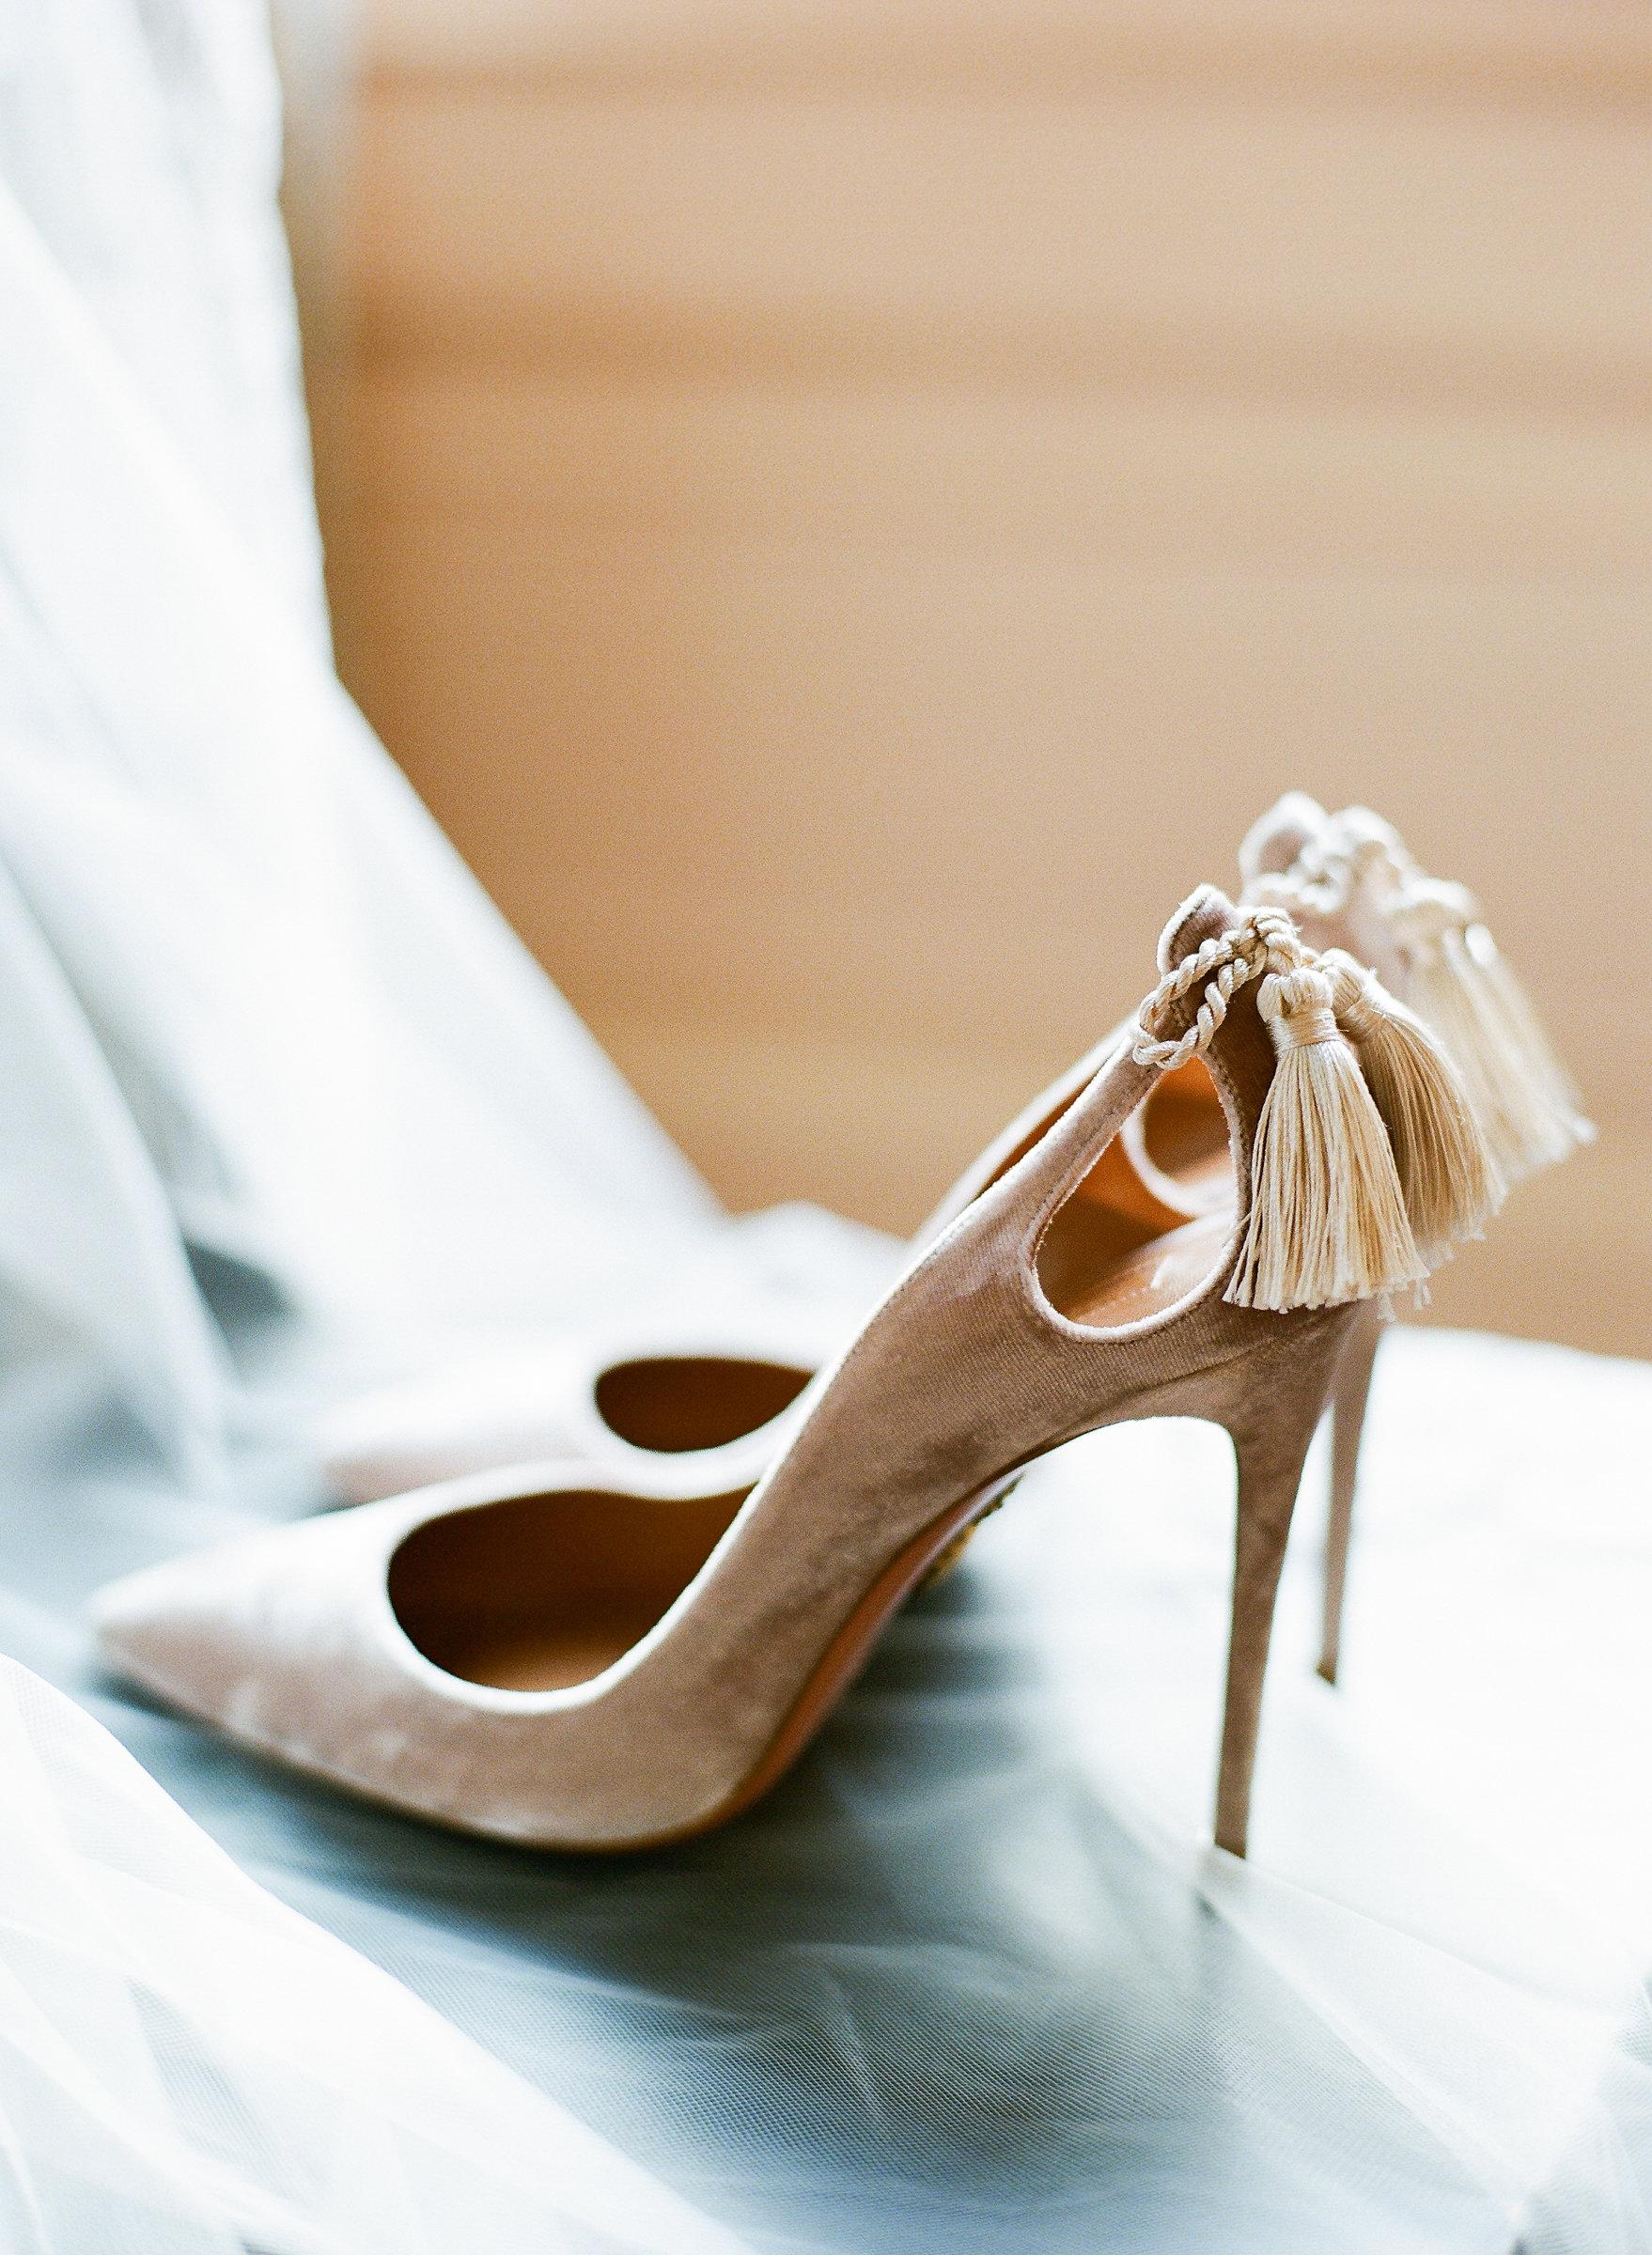 hamida charlie charleson wedding shoes tassel